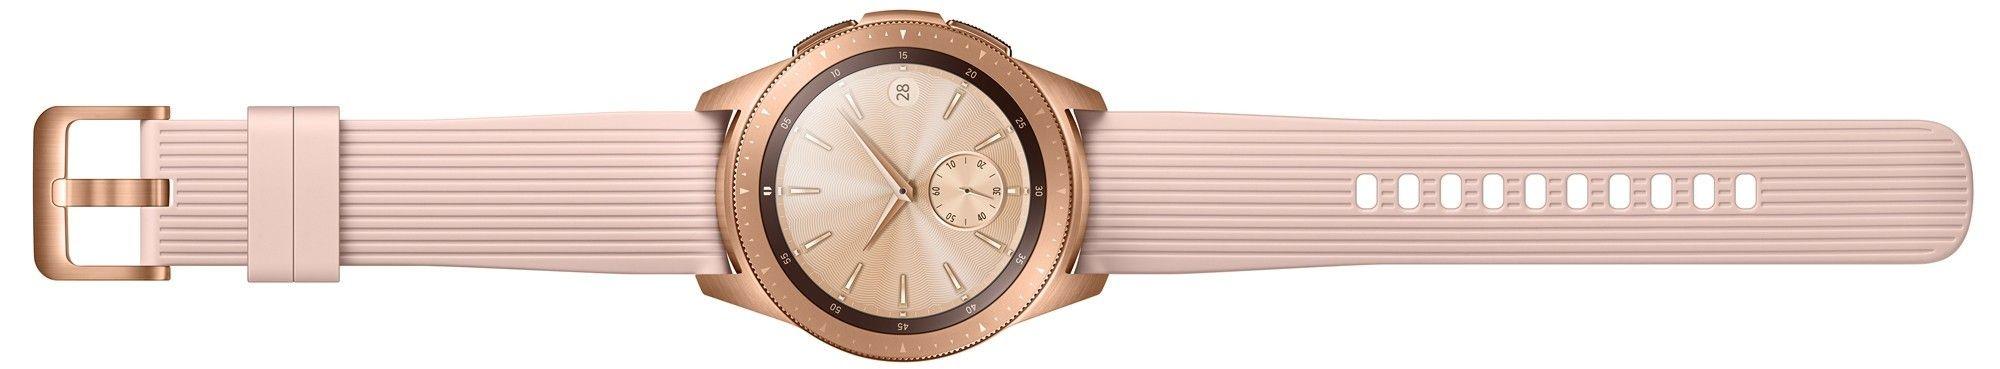 Смарт часы Samsung Galaxy Watch 42mm (SM-R810NZDASEK) Gold от Територія твоєї техніки - 6